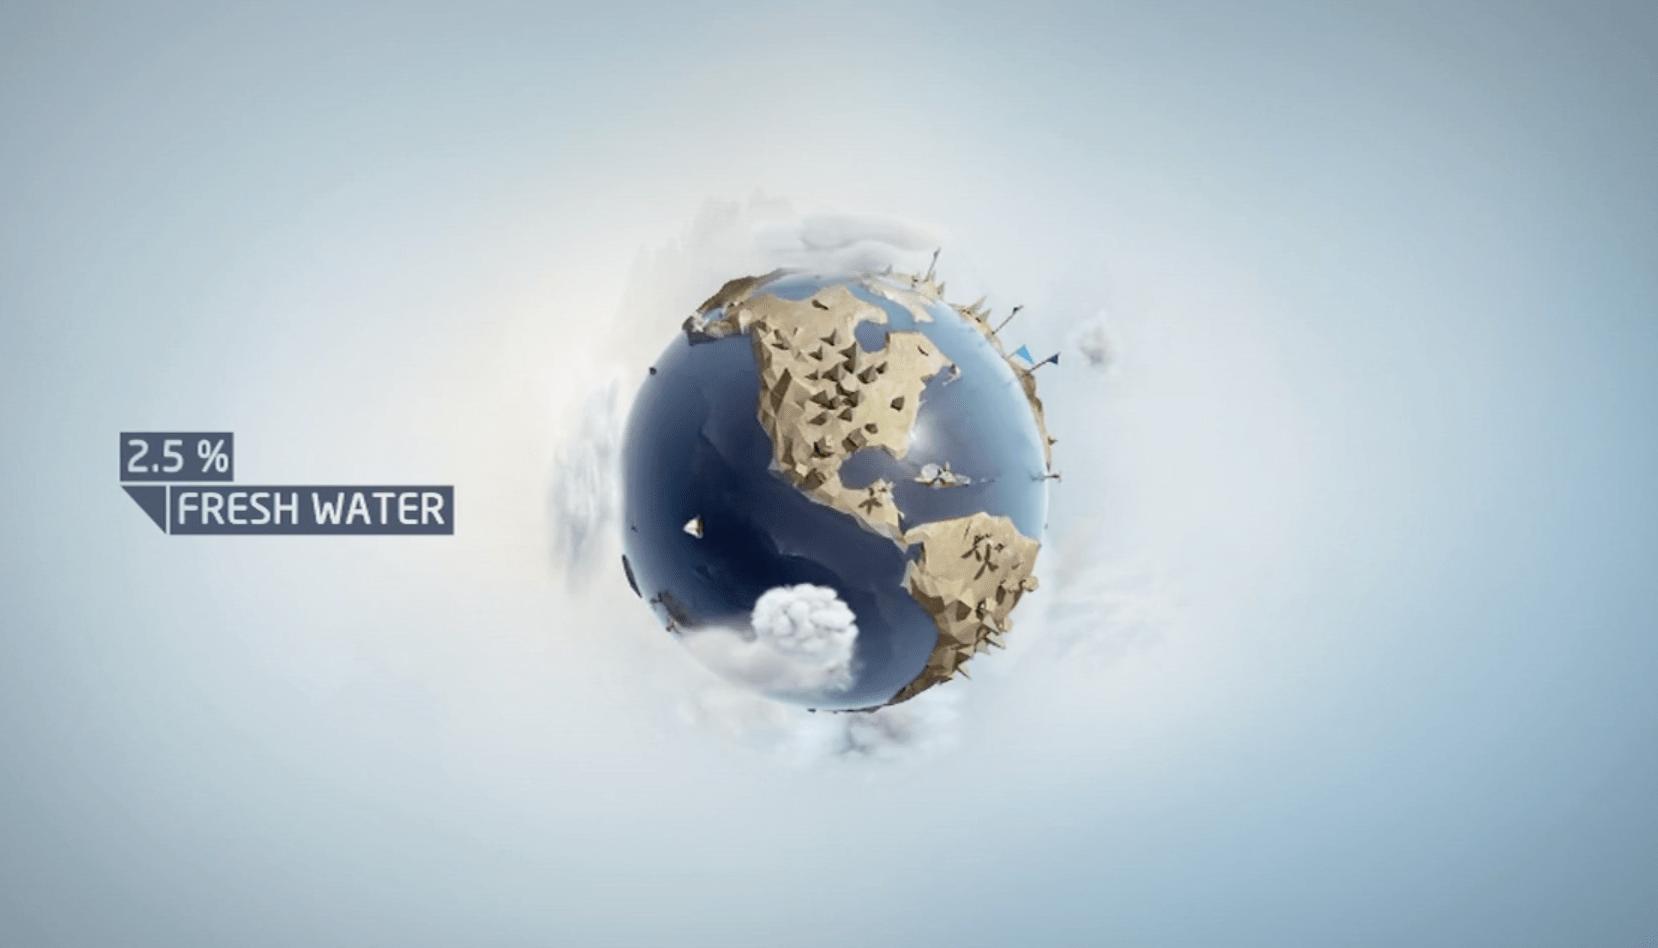 Video & Film Production Dubai - UAE - image Screen-Shot-2021-03-15-at-4.55.59-PM on https://www.kalideme.com